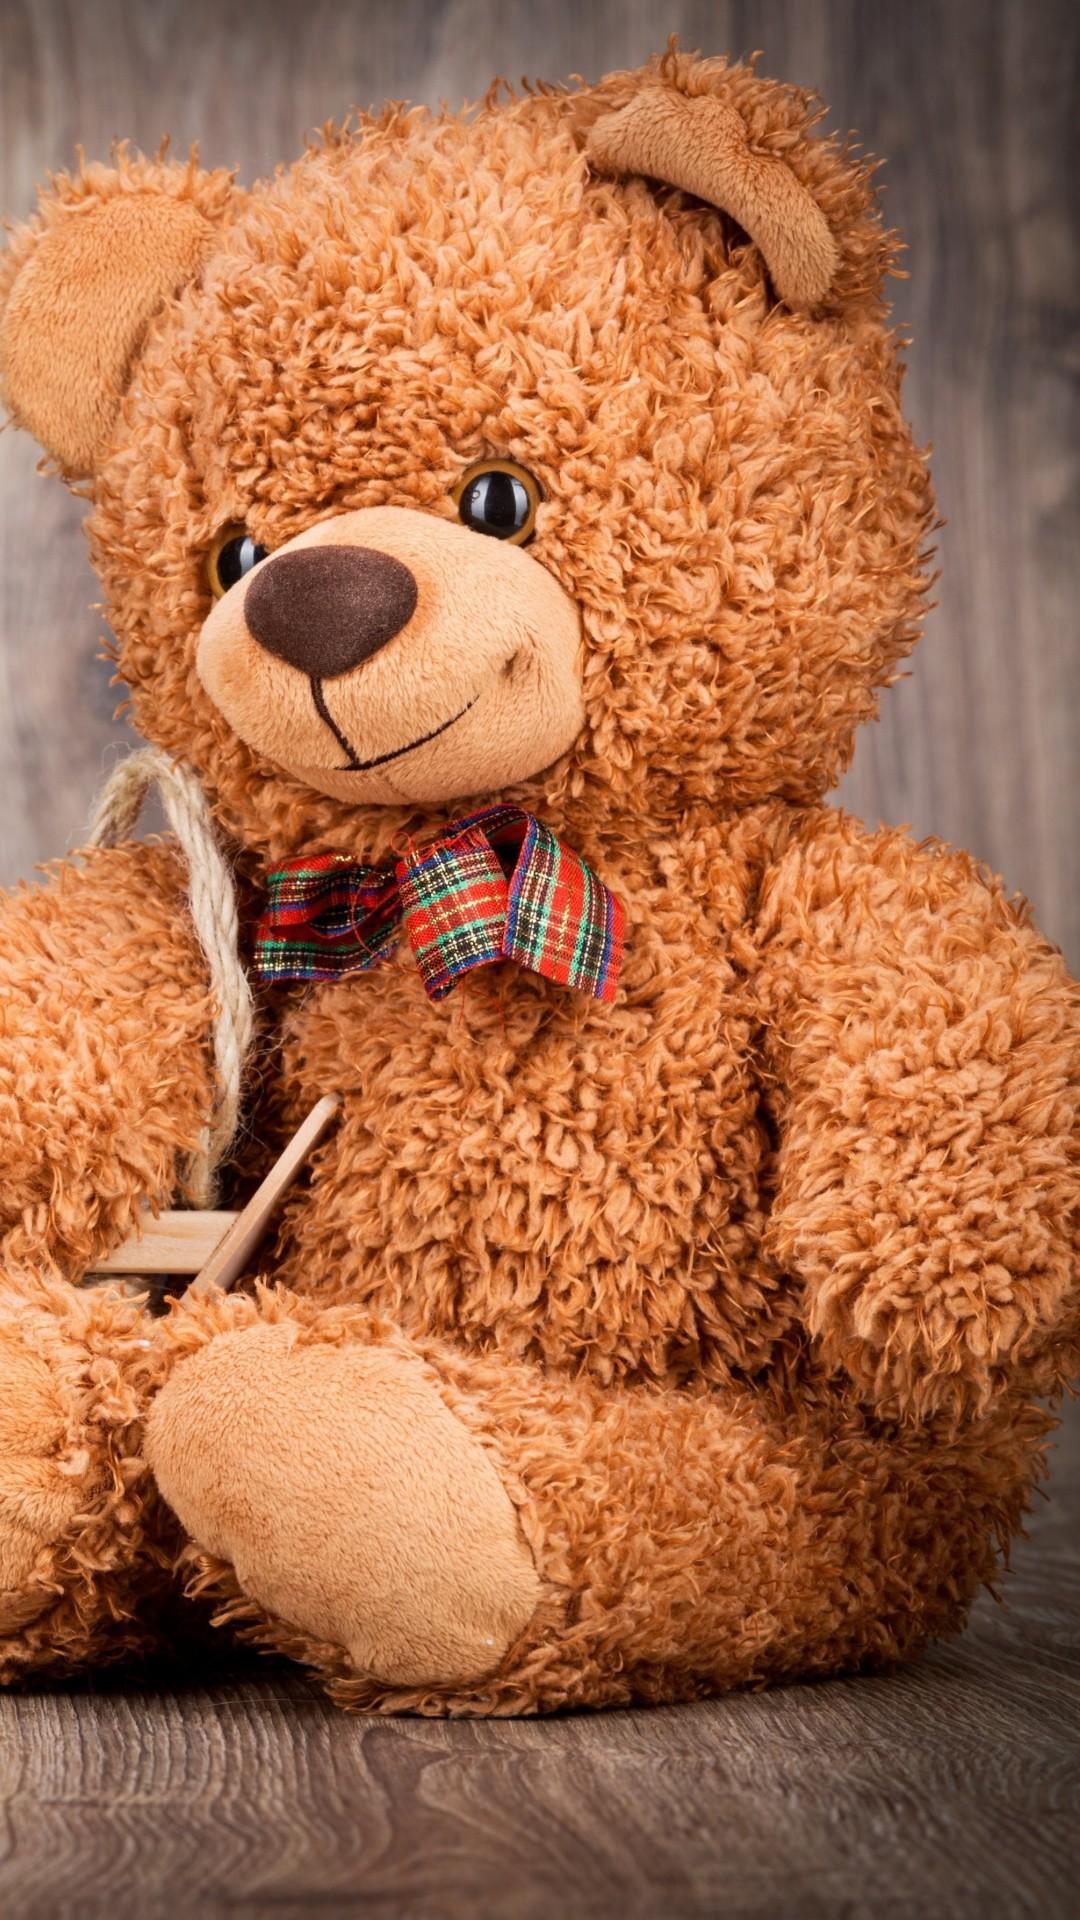 Cute Cat Iphone 6 Wallpaper Cute Teddy Bears Wallpapers 59 Images